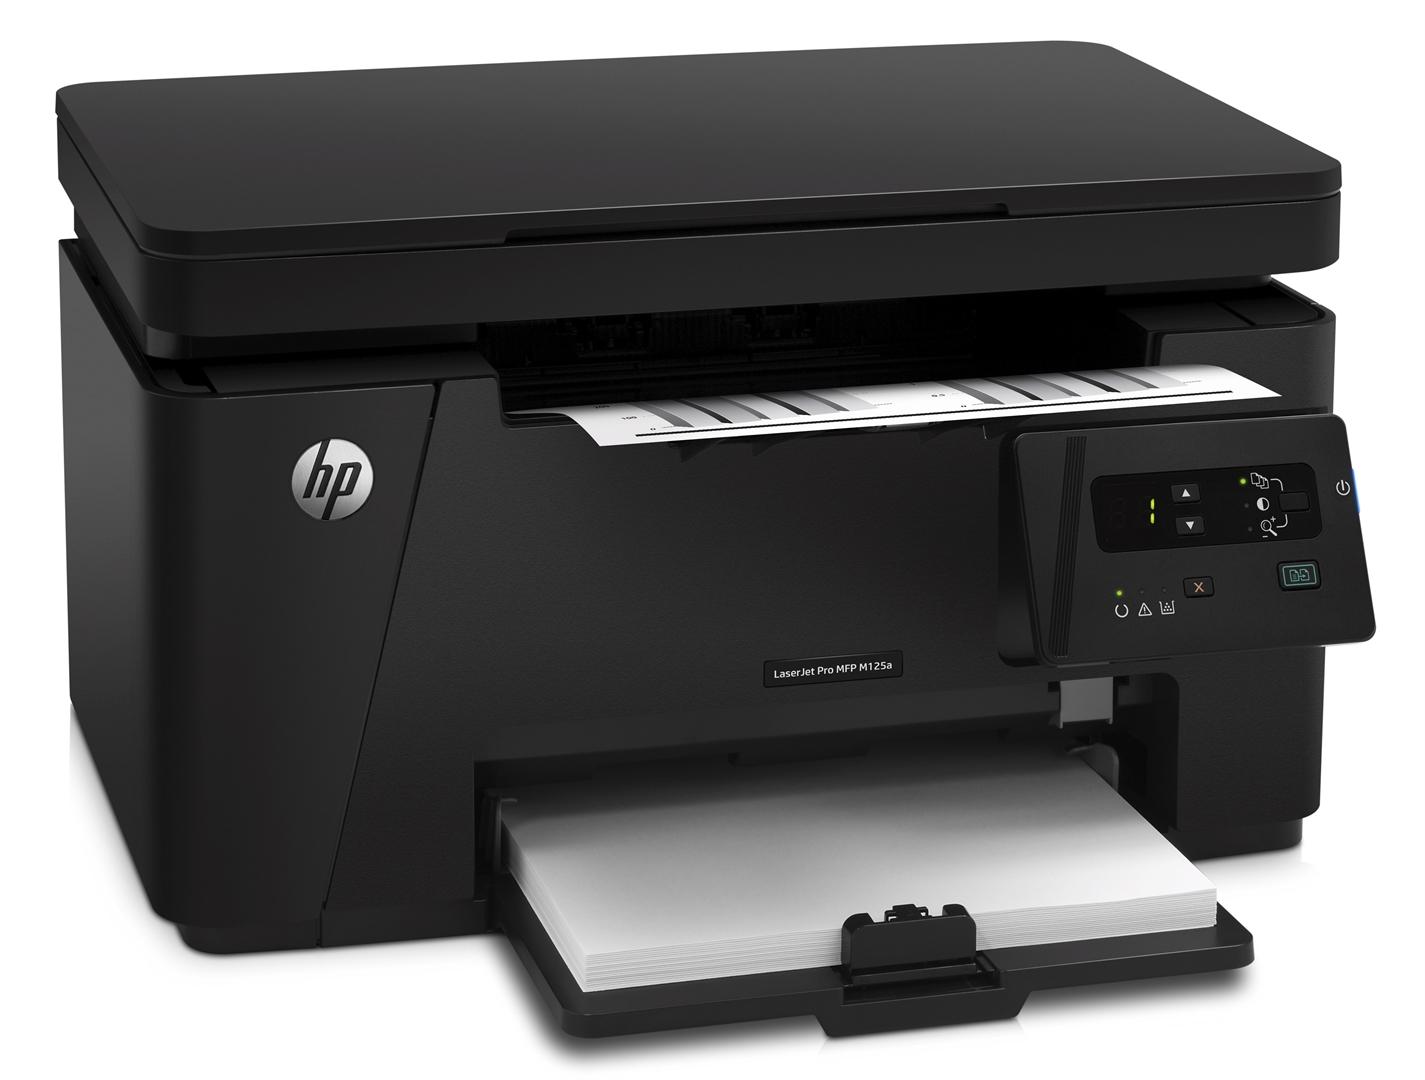 Драйверы для HP LaserJet Pro M125ra - Driver.ru